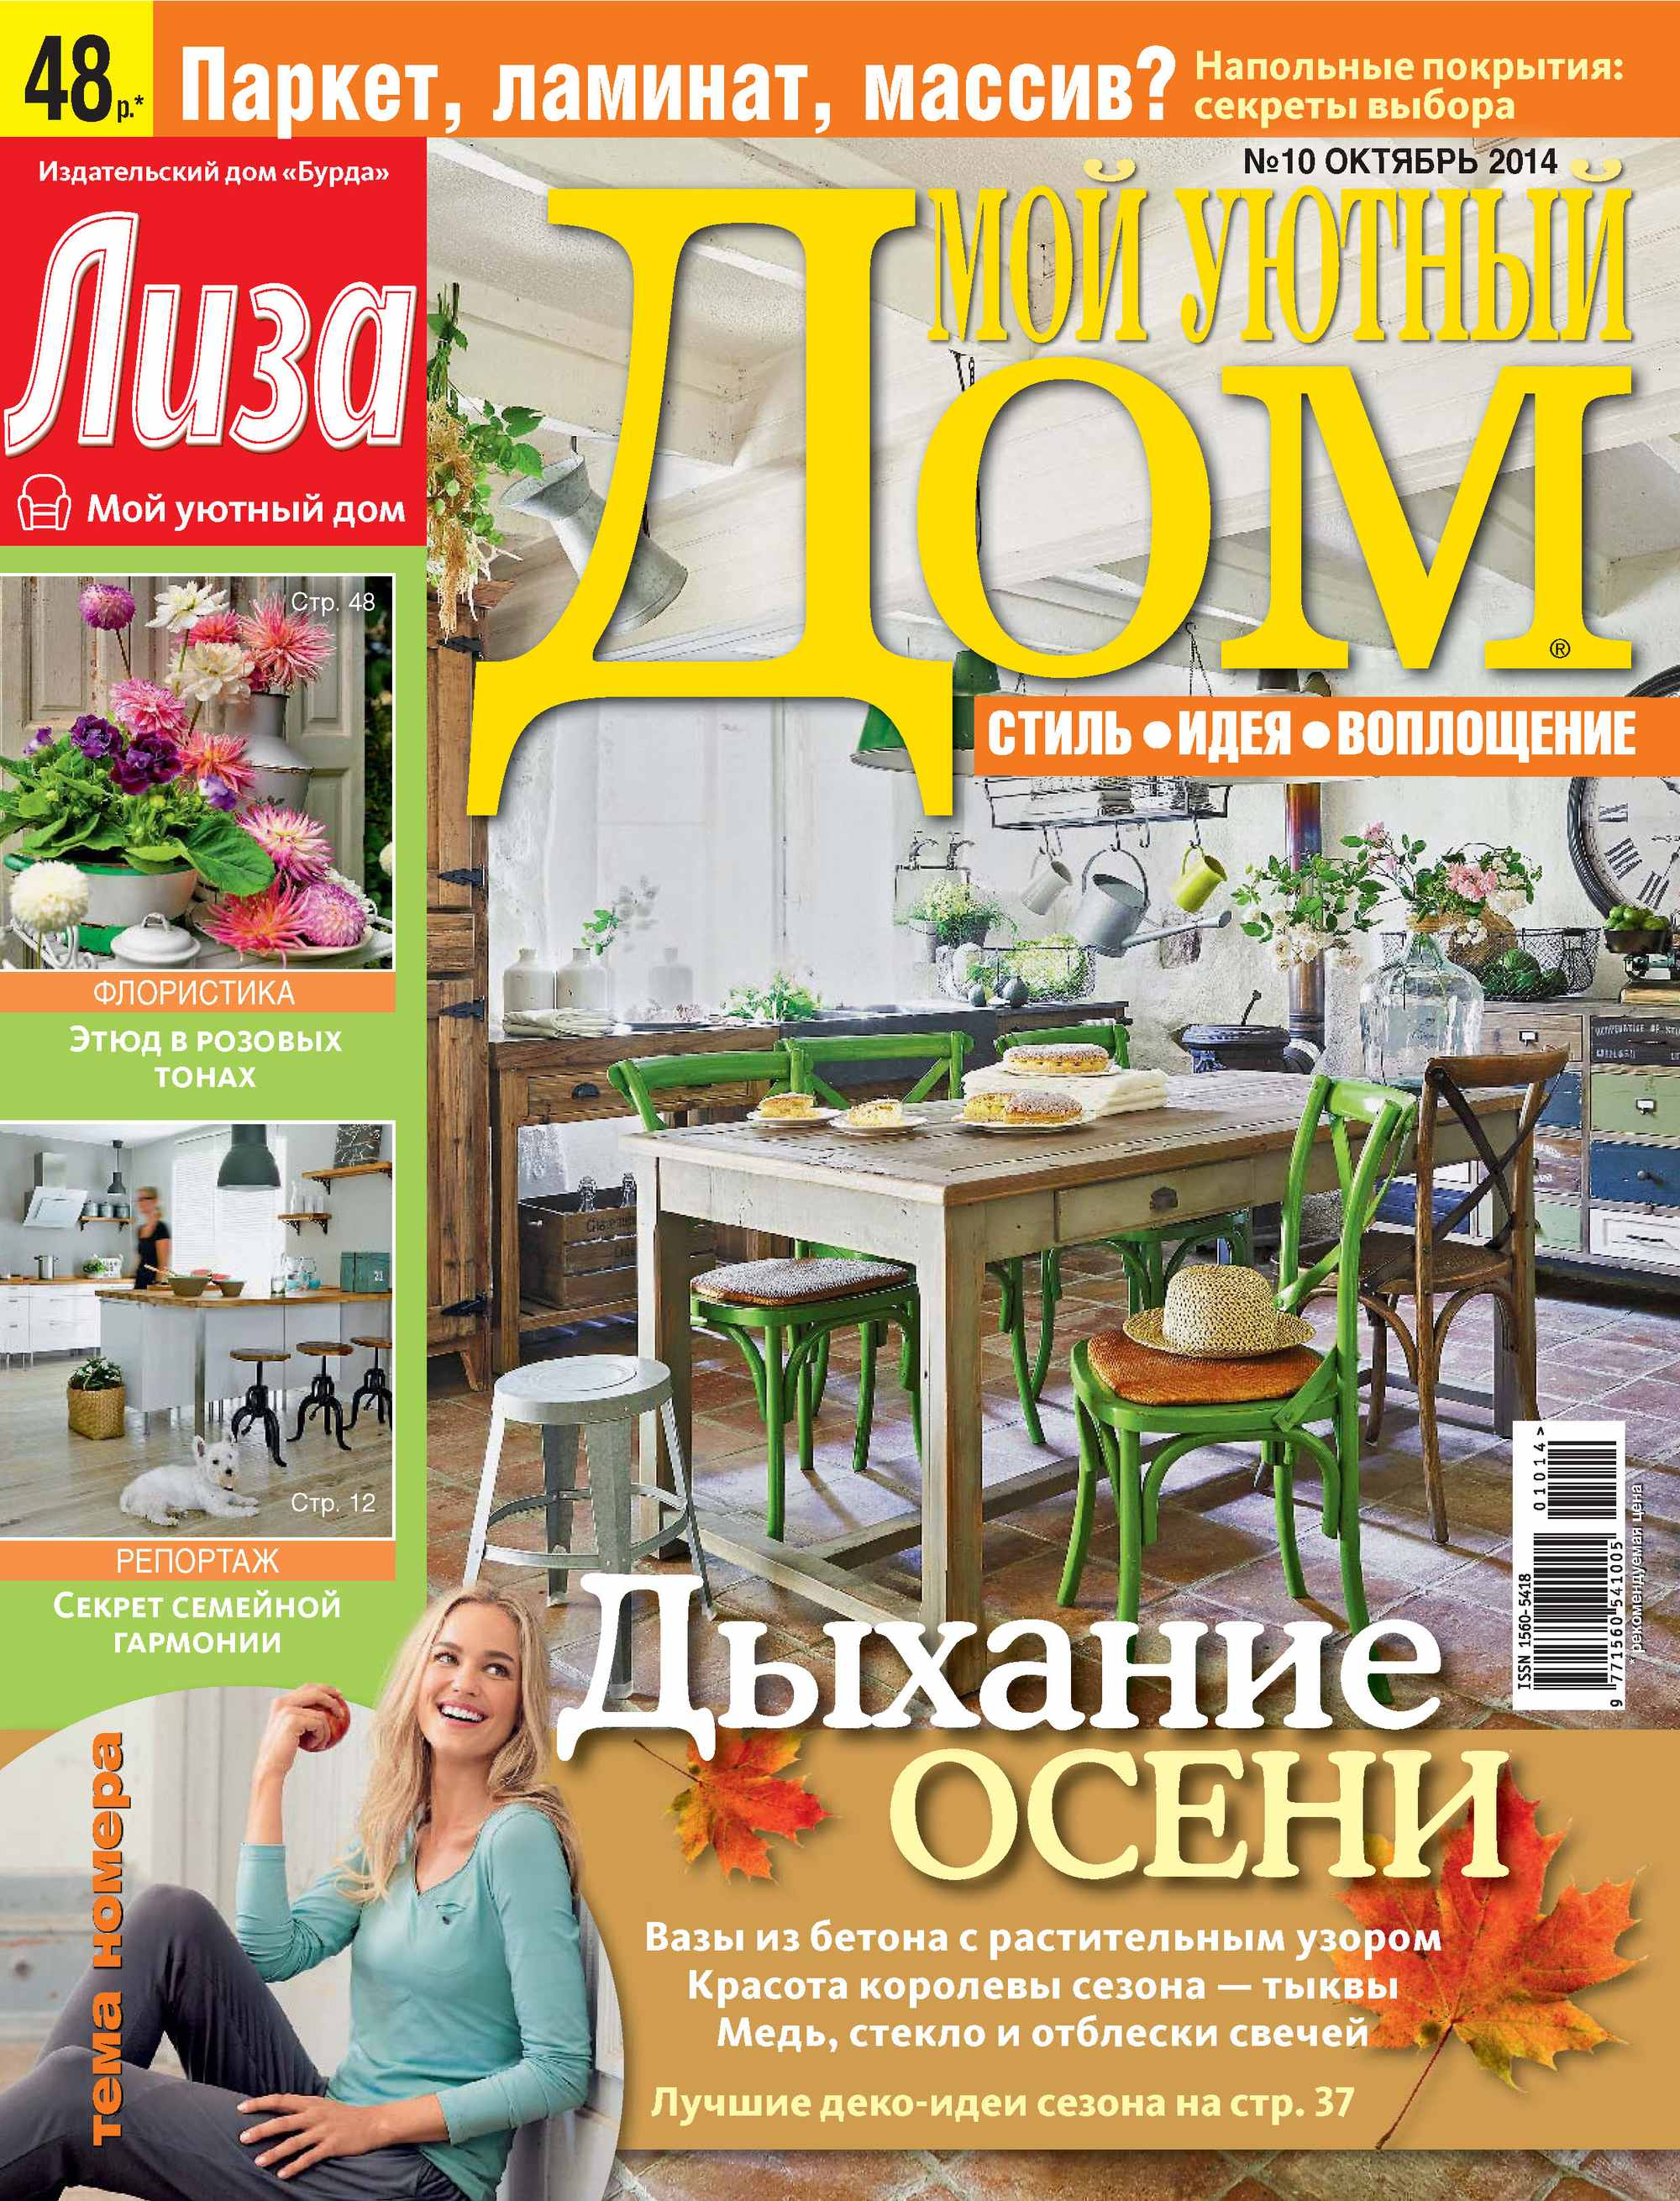 ИД «Бурда» Журнал «Лиза. Мой уютный дом» №10/2014 ид бурда журнал лиза мой уютный дом 04 2014